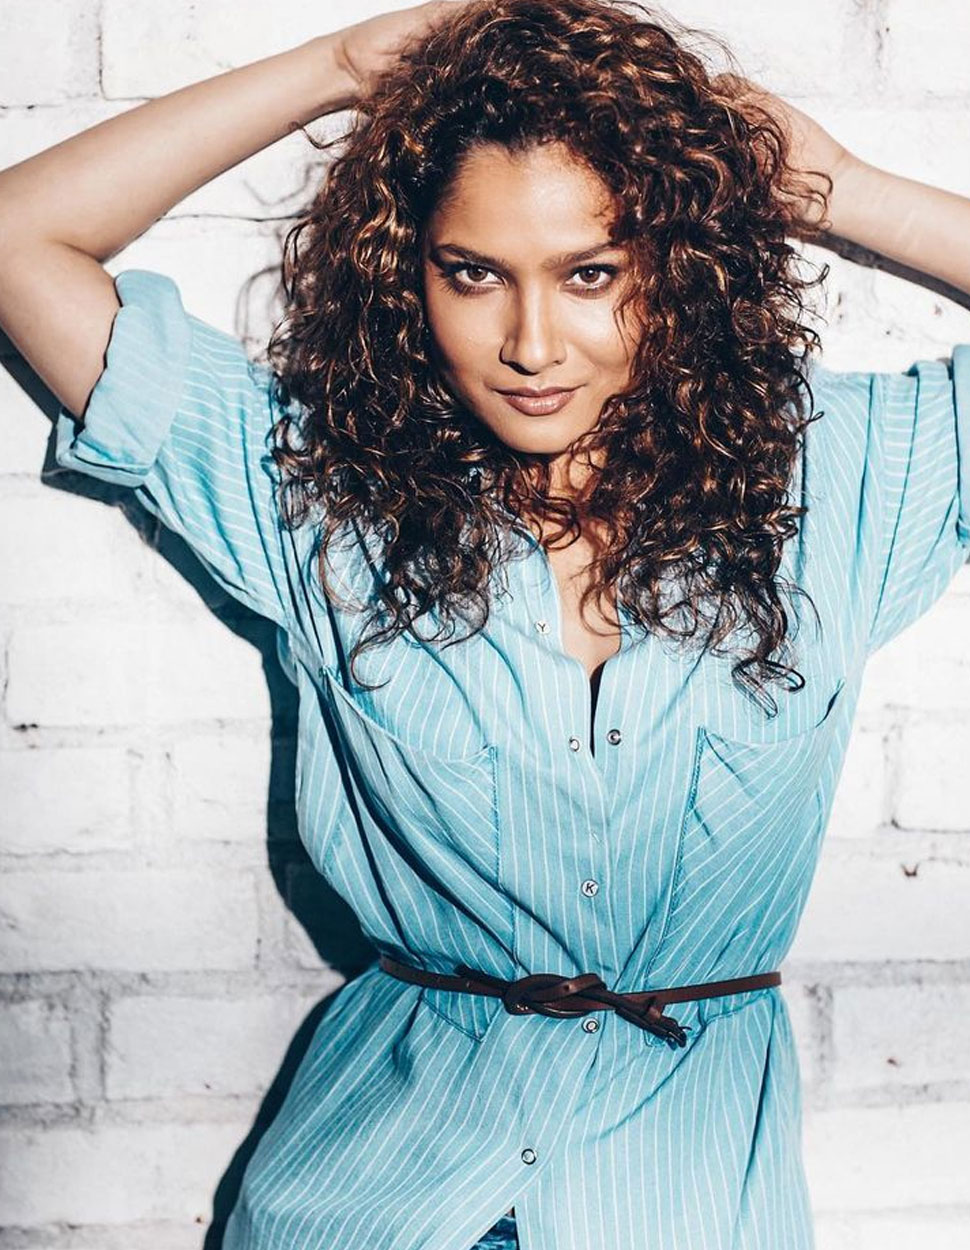 Ankita Lokhande in New look photos